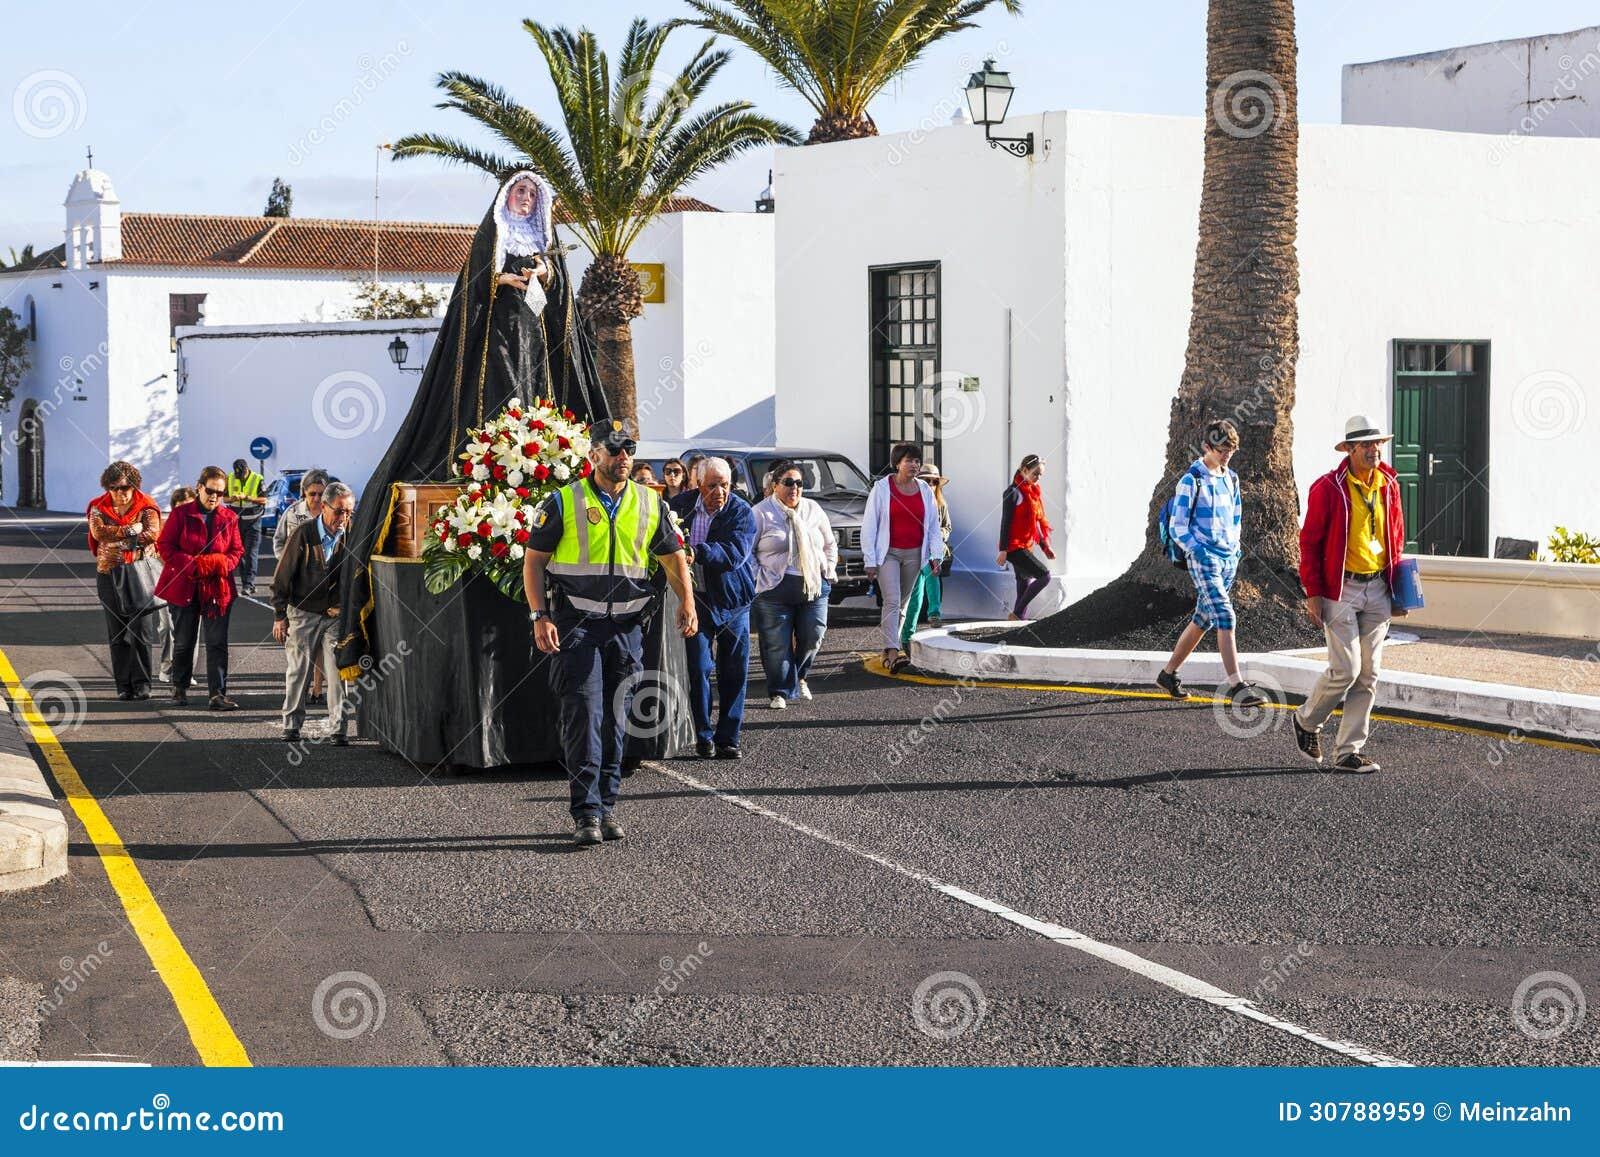 Cortège de Pâques avec la statue de Mary sainte dans Yaiza, Lanzarote